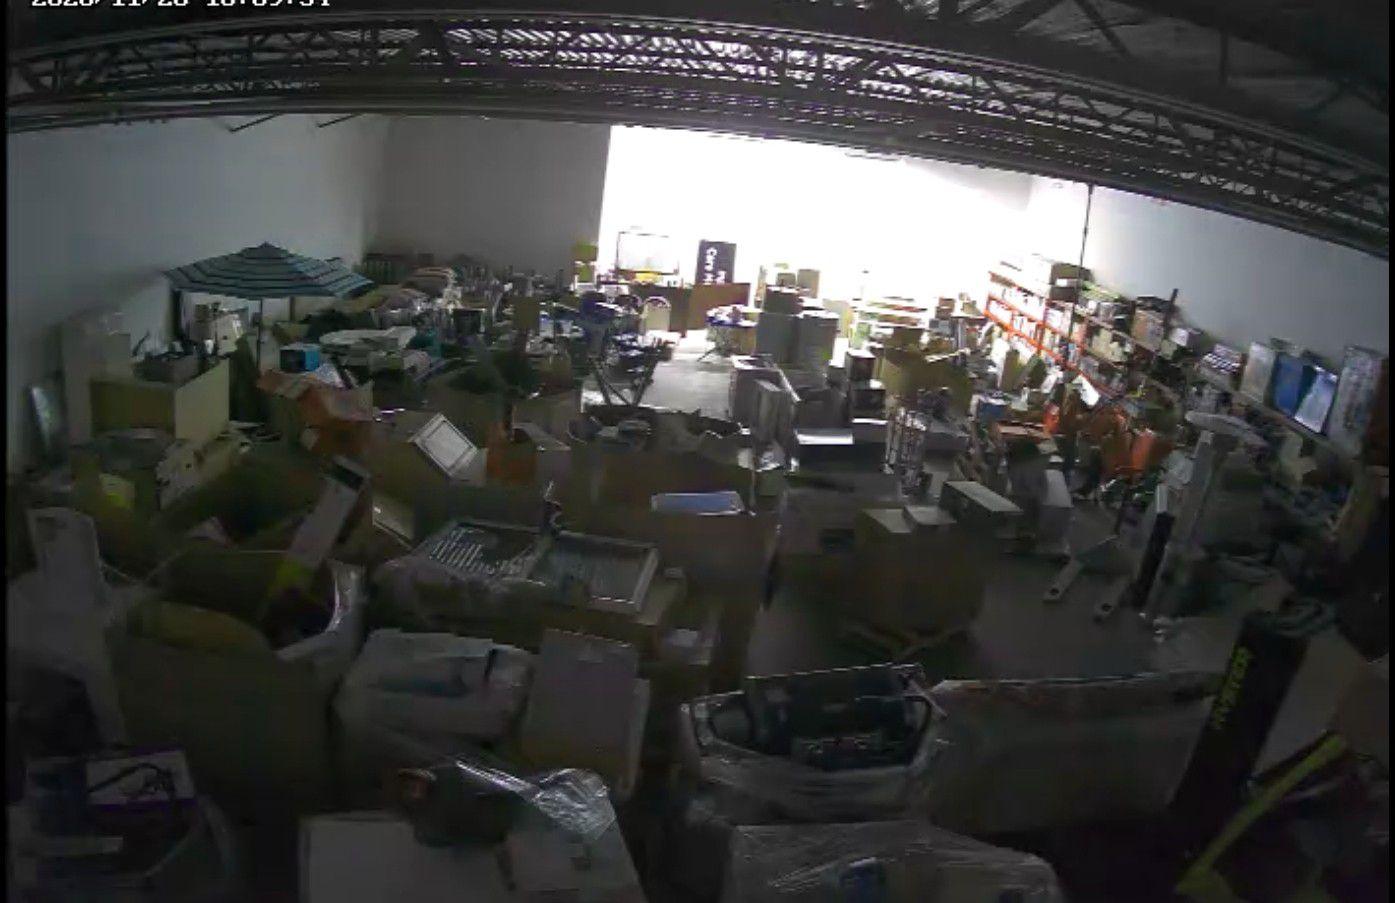 Black friday fully sto led warehouse and nothing over $100